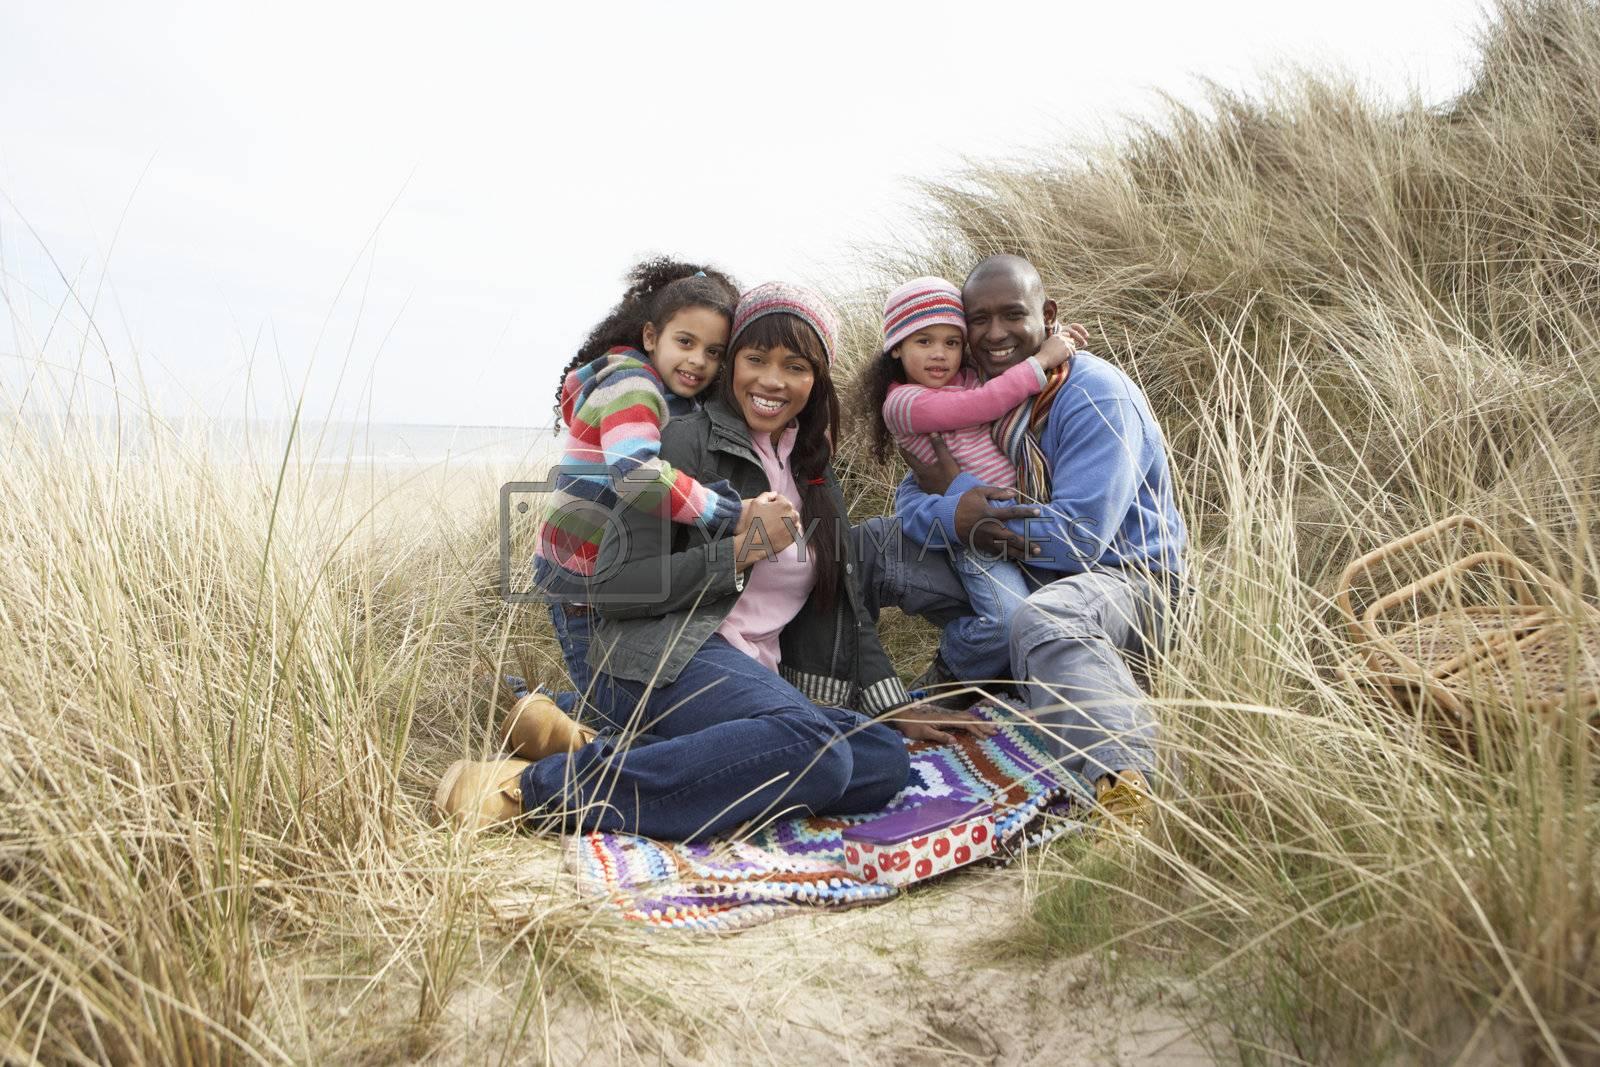 Family Sitting In Dunes Enjoying Picnic On Winter Beach